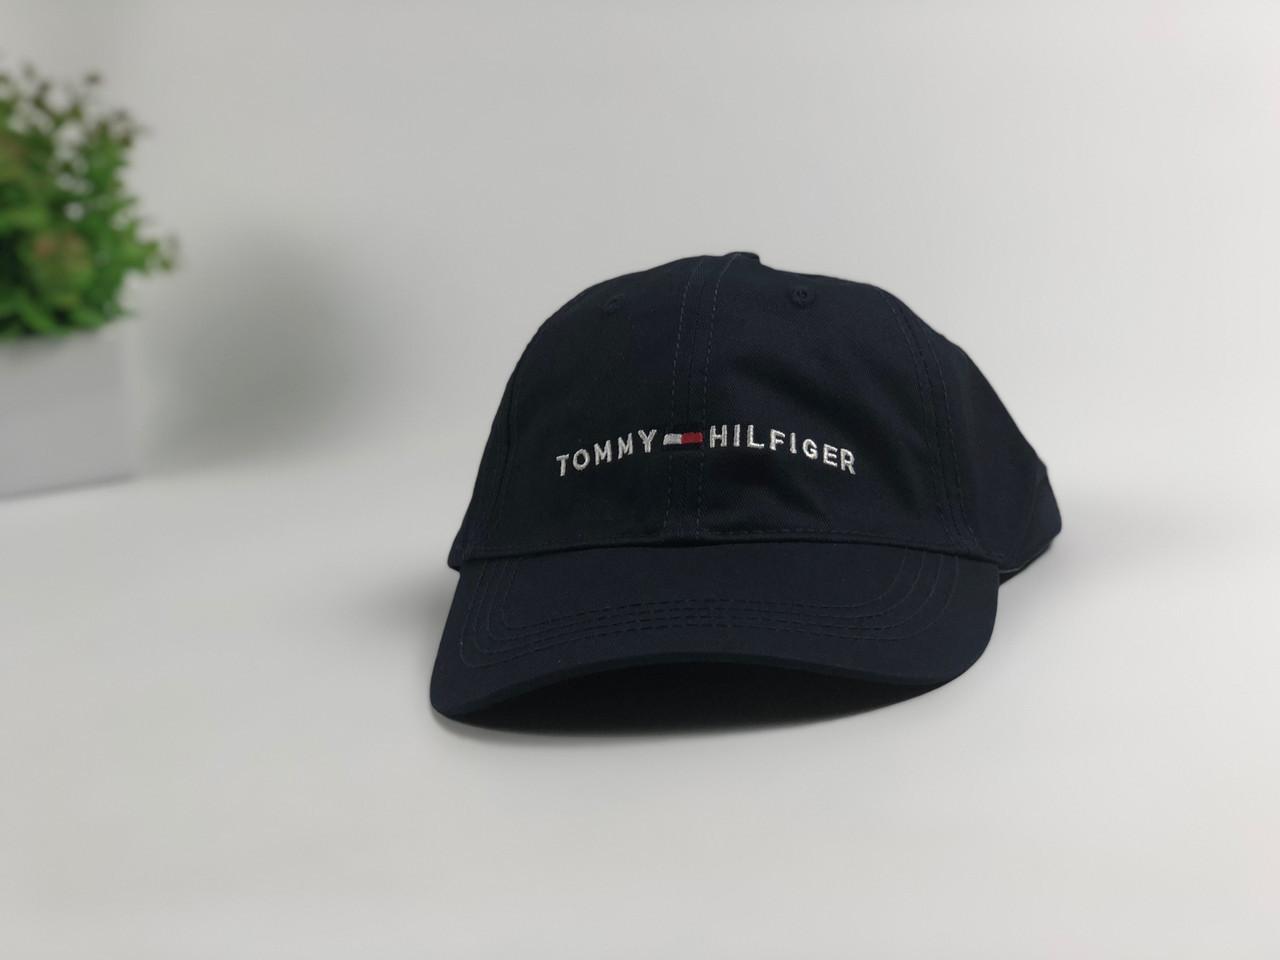 Кепка бейсболка Tommy Hilfiger надпись+лого (темно-синяя)